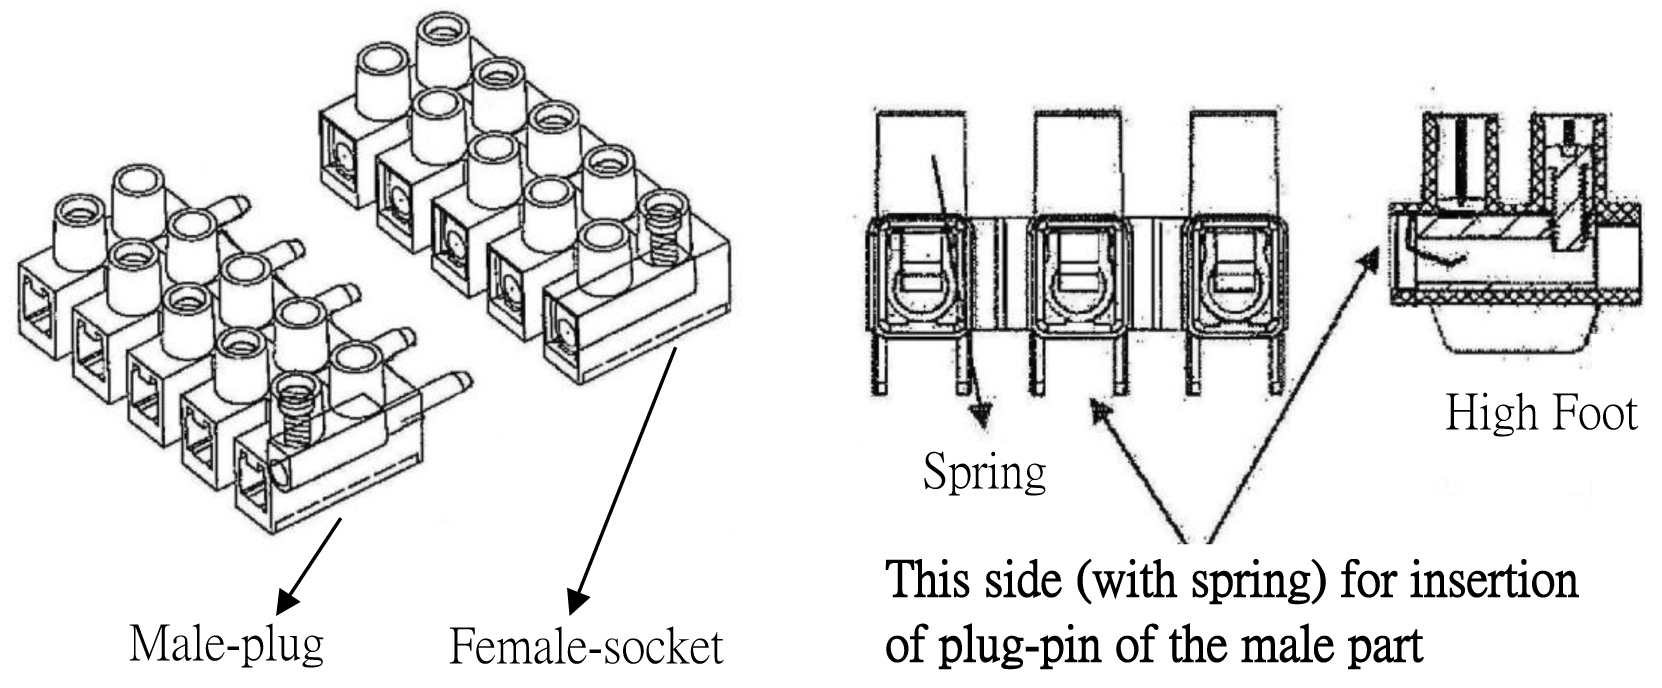 hylec accessories